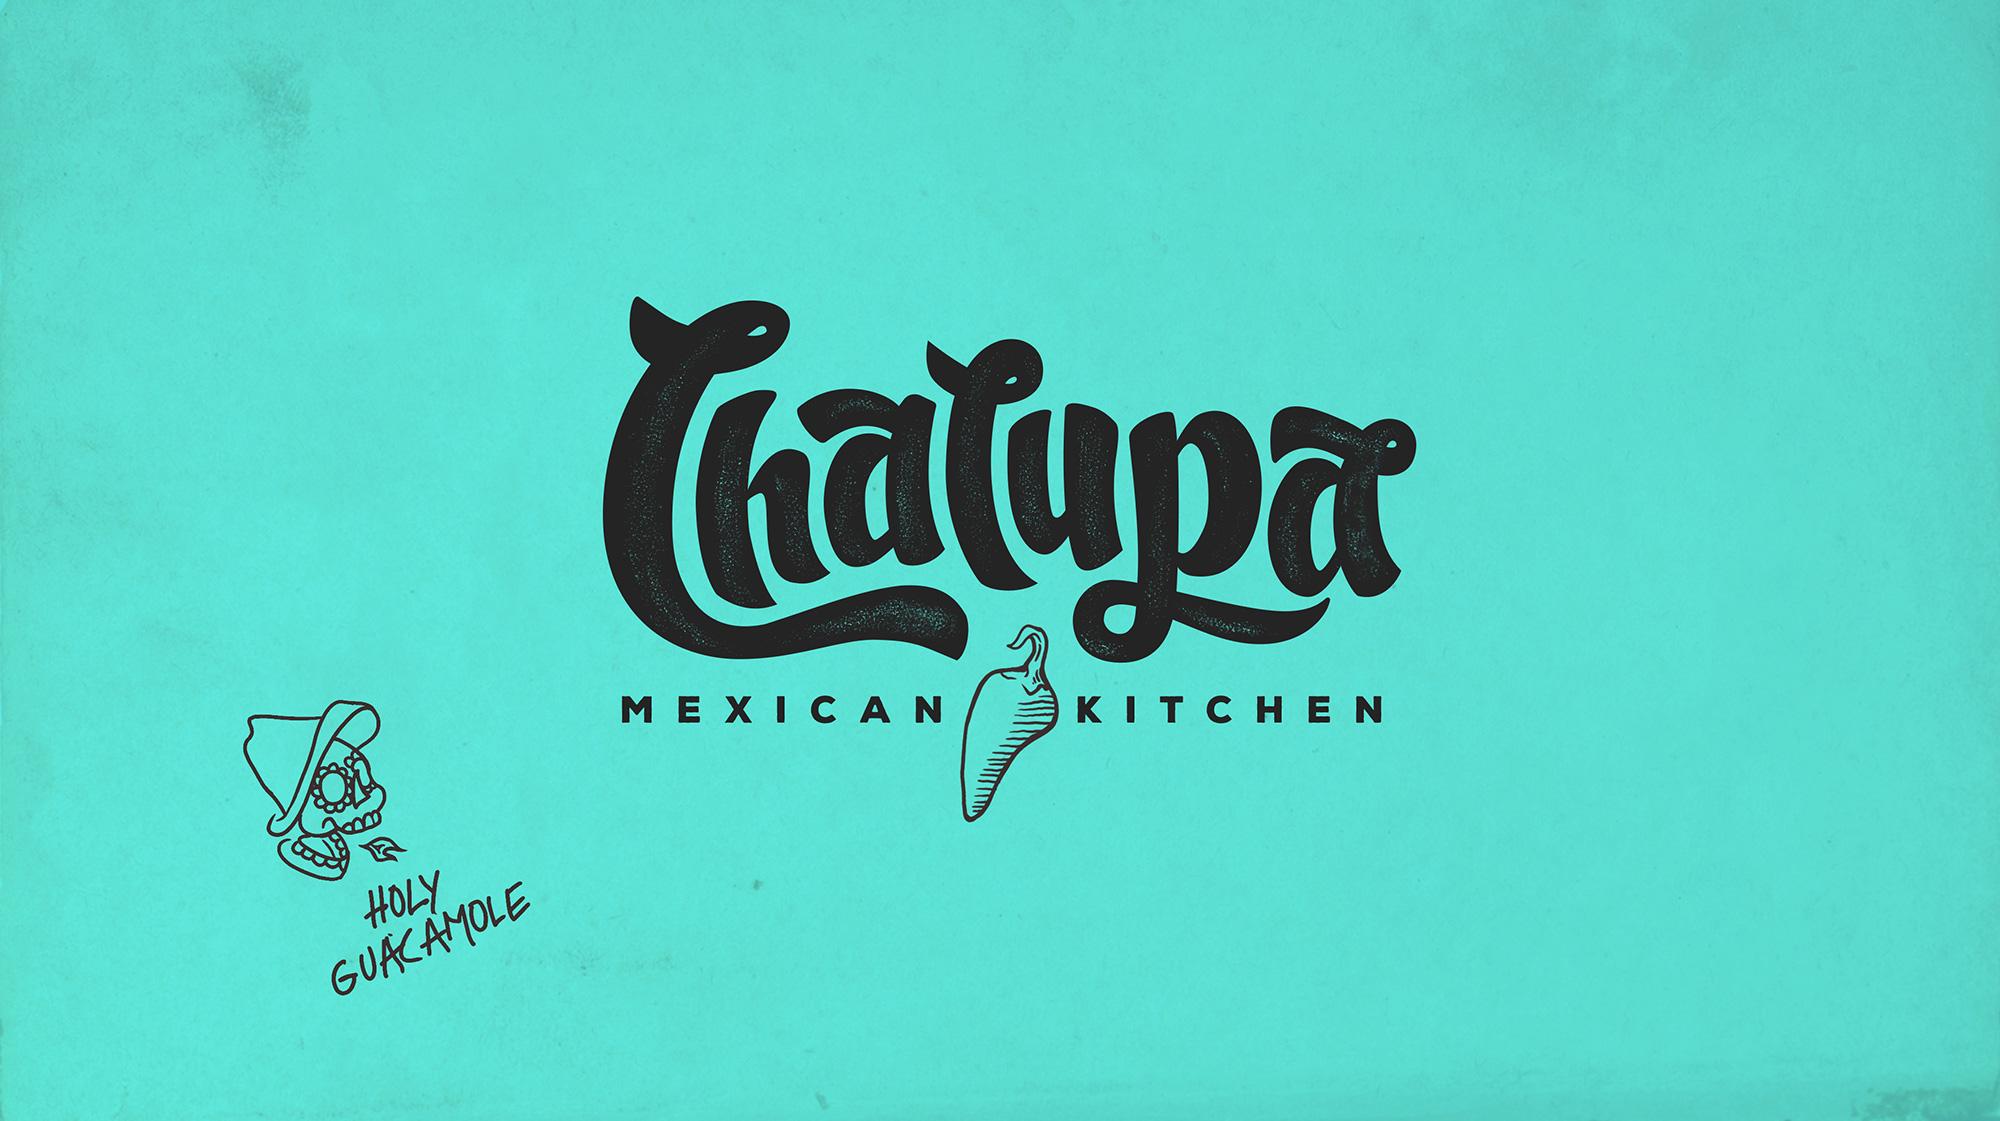 Chalupa unused logoproposal